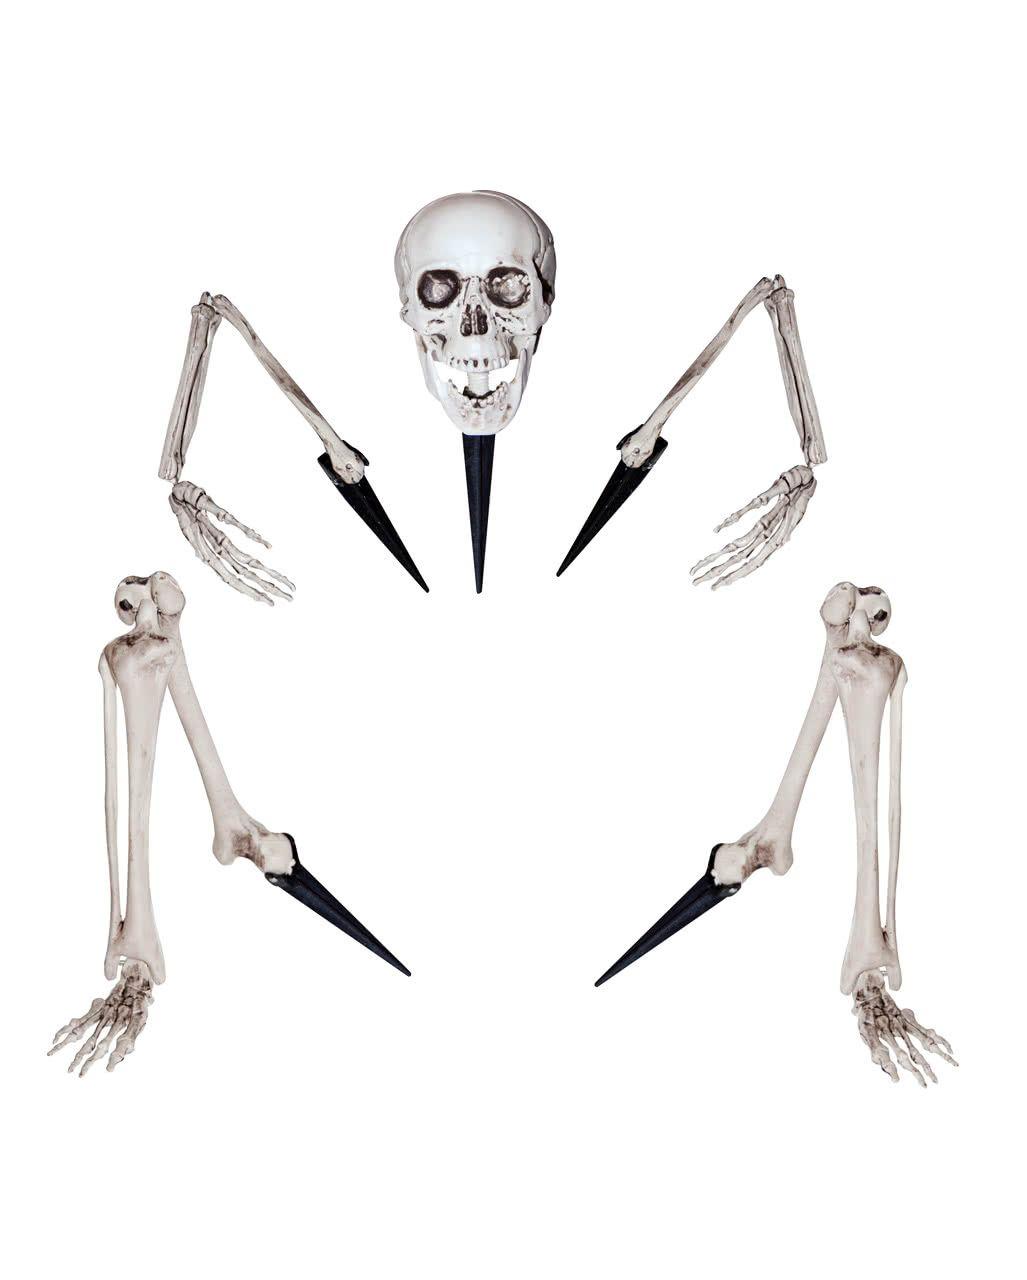 Halloween Deko Shopch.Skelett Knochenteile Fur Den Garten Halloween Deko Horror Shop Com Halloween Deko Halloween Deko Horror Halloween Deko Gunstig